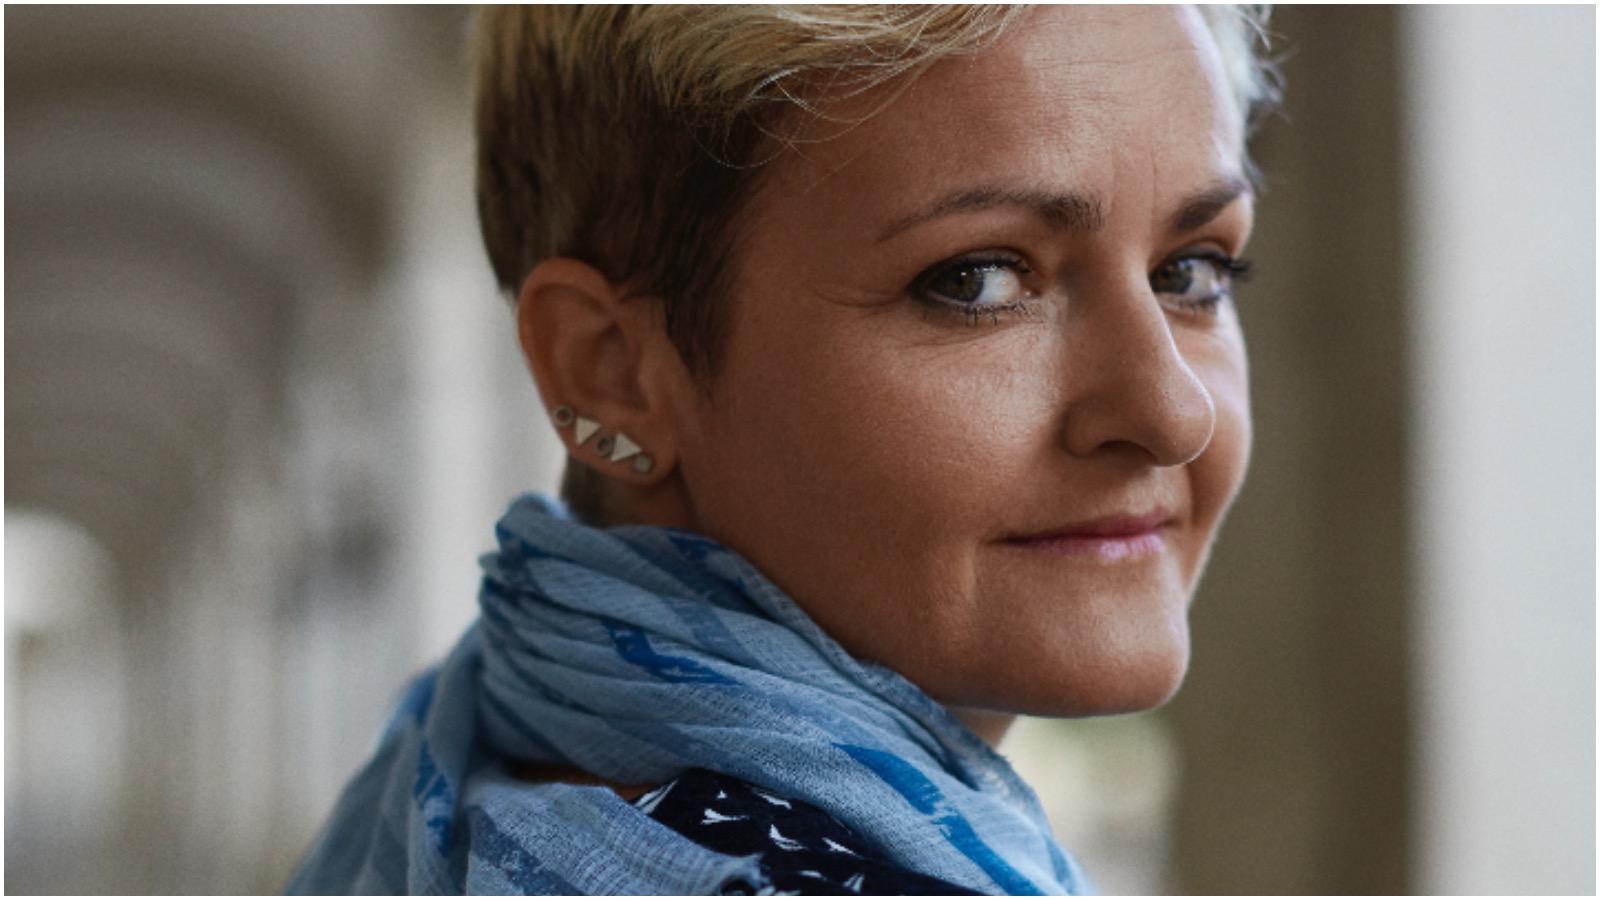 Pernille Rosenkrantz-Theil: Næsten to årtier med mere eller mindre borgerlige statsministre har desværre sat sine spor på den skandinaviske drøm